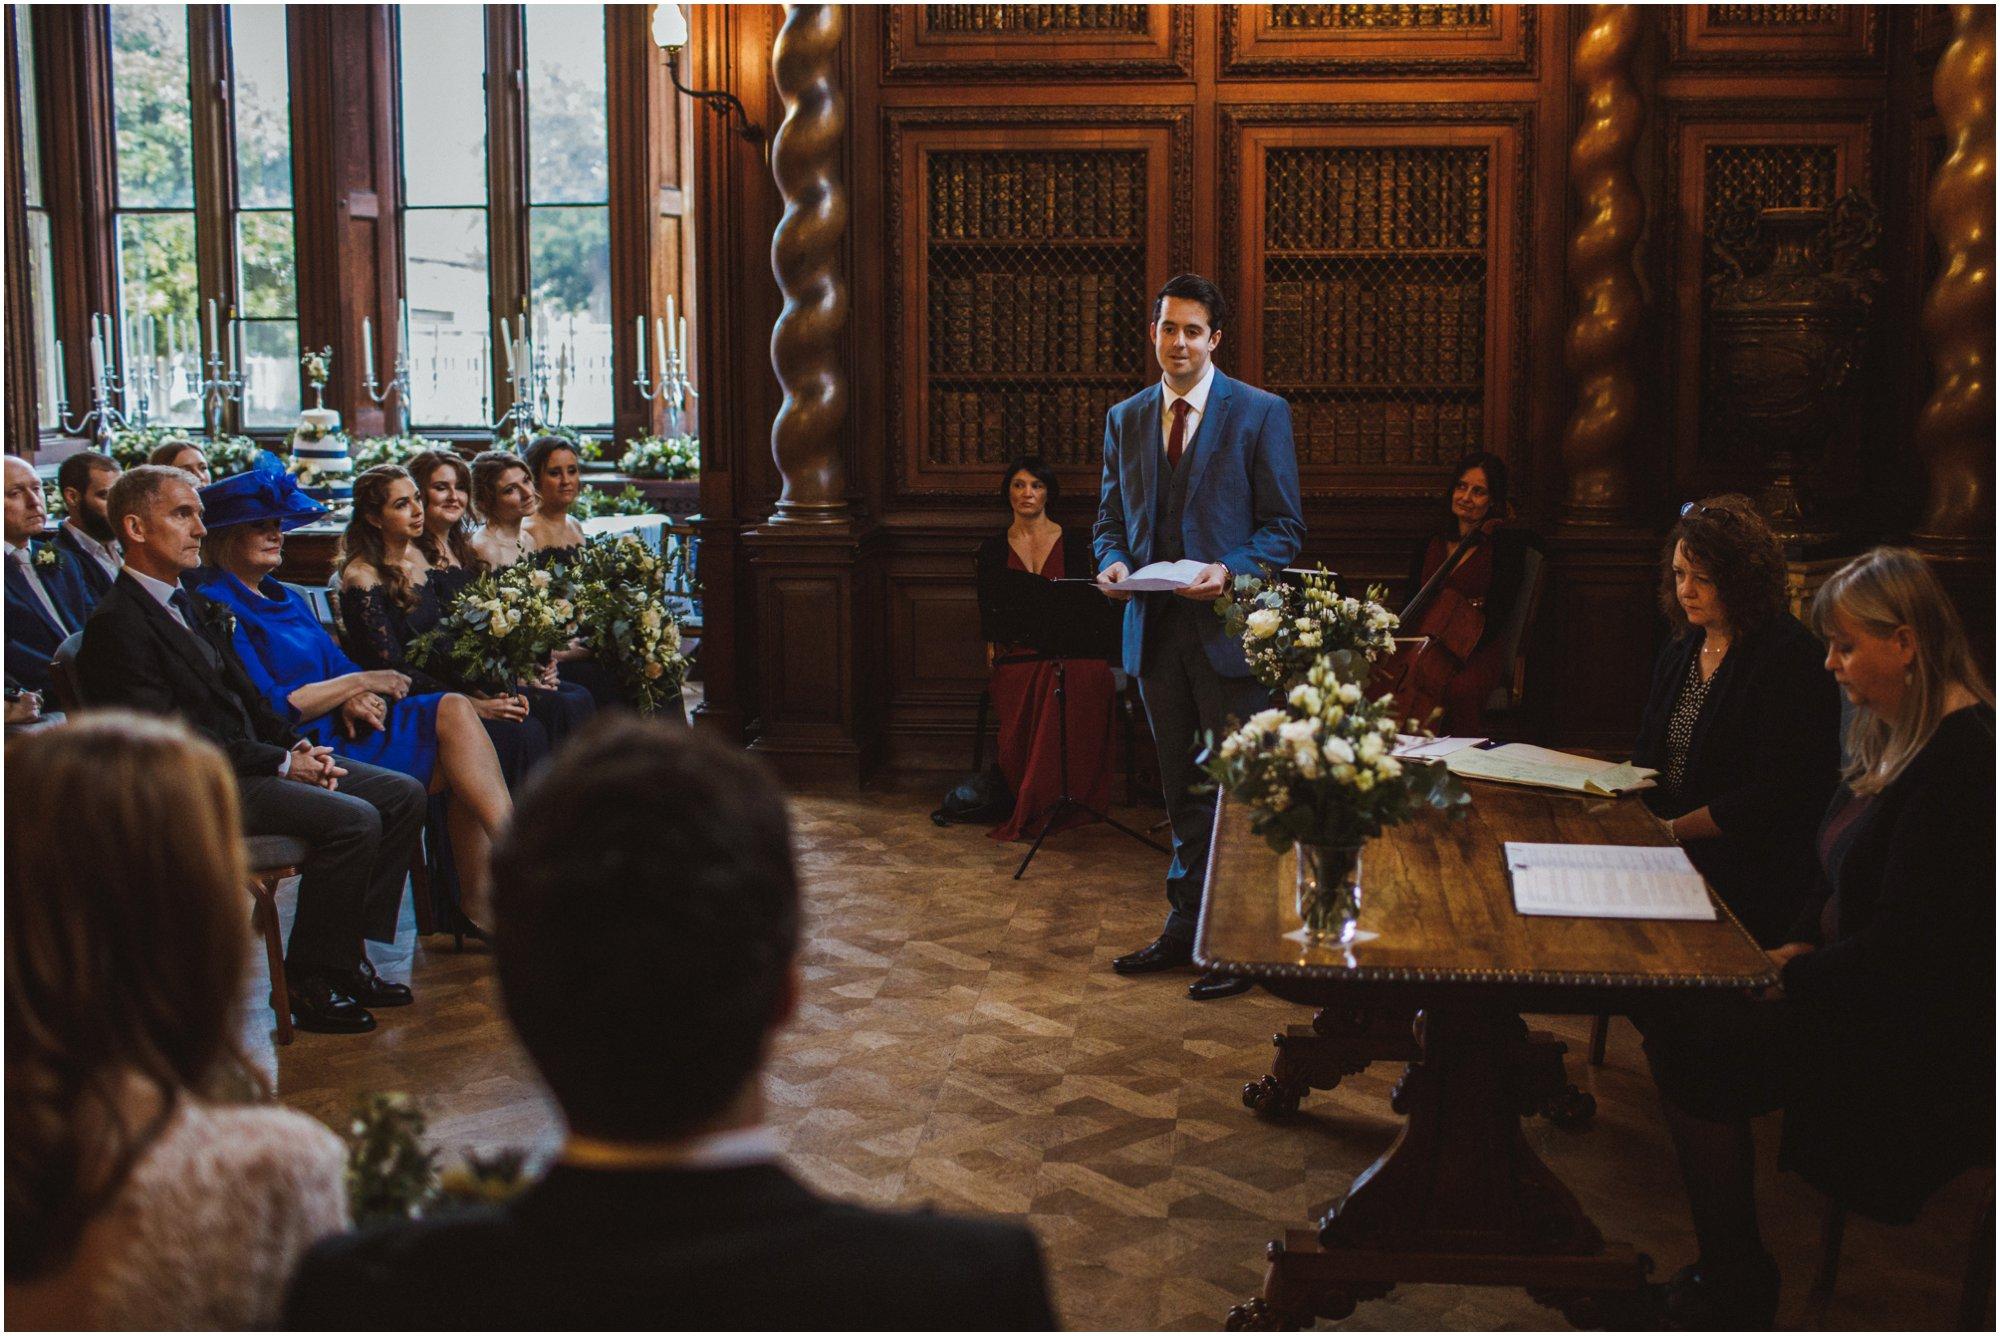 Burghley House Wedding Stamford_0051.jpg